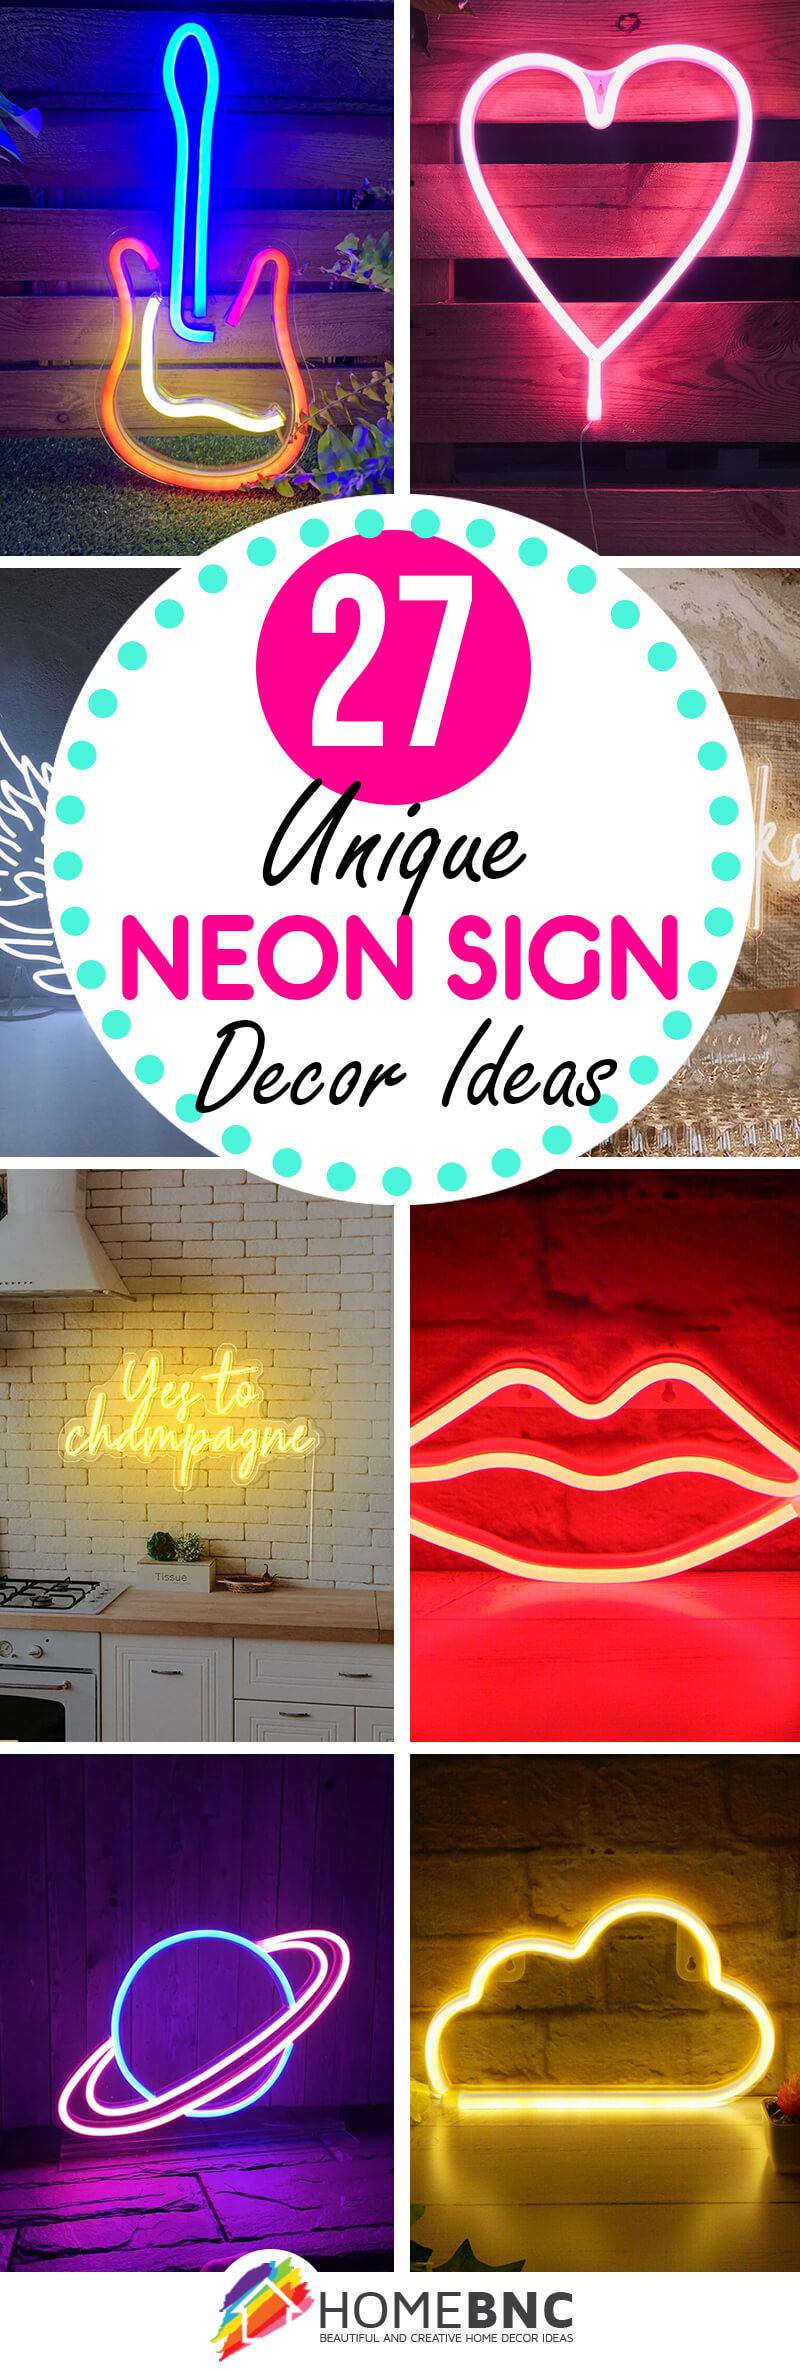 Best Neon Sign Decor Ideas